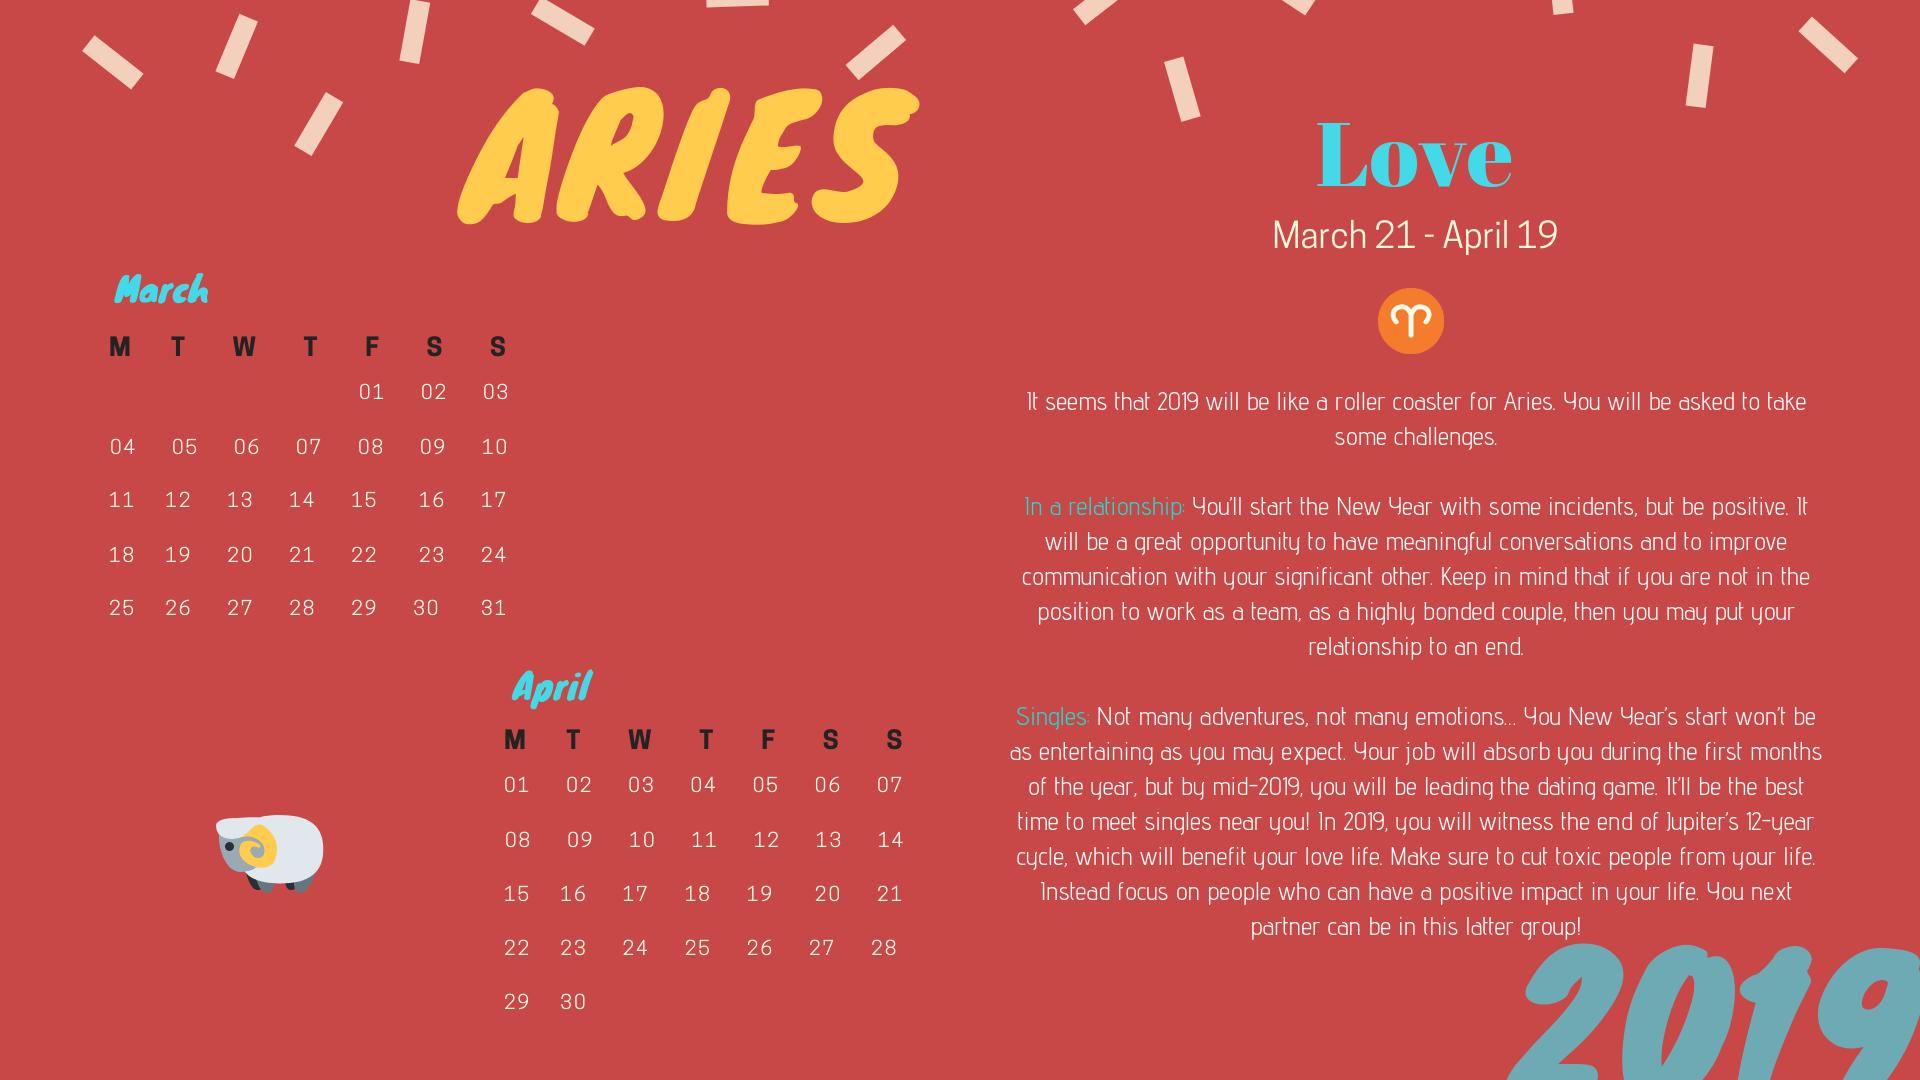 Horoscope: Find love in 2019!